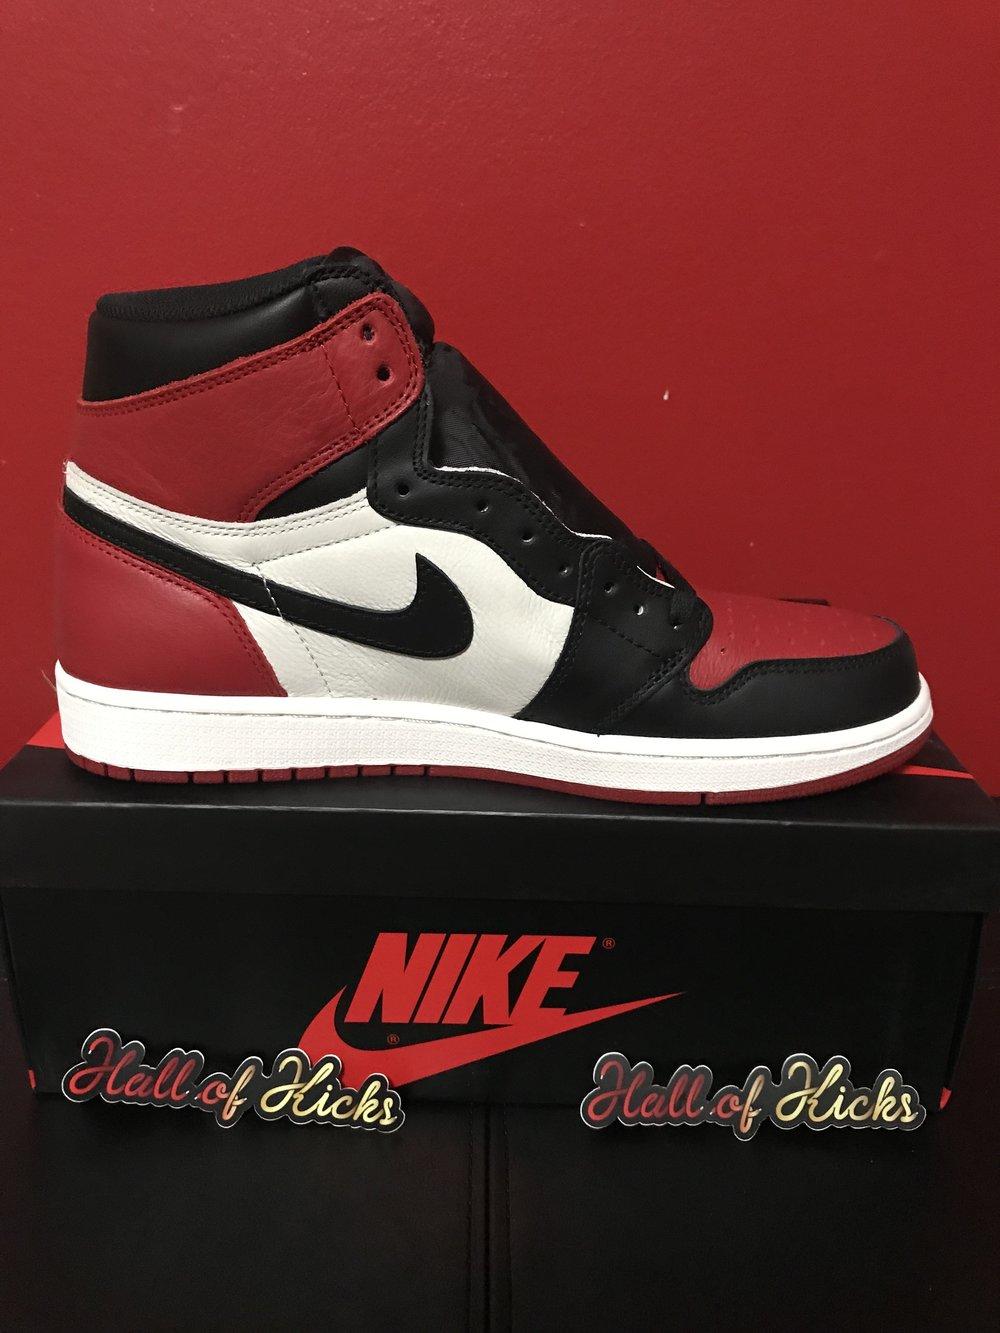 ca7a137d904 Air Jordan Retro 1 - Bred Toe — Hall of Kicks